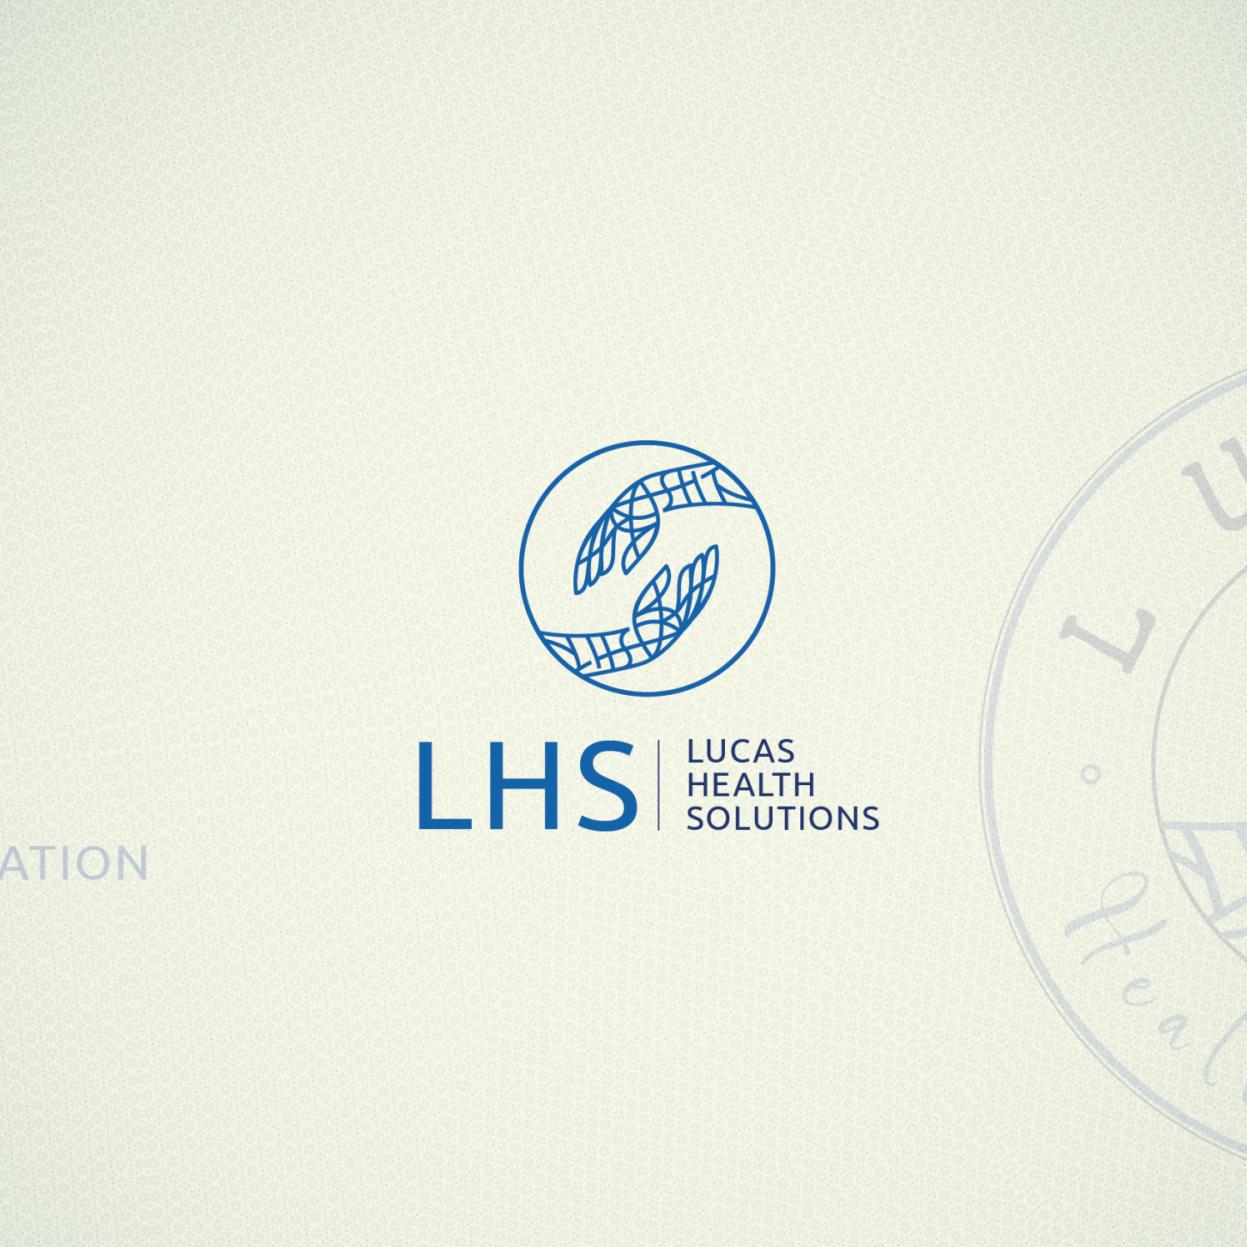 Logo for Lucas Health Solutions